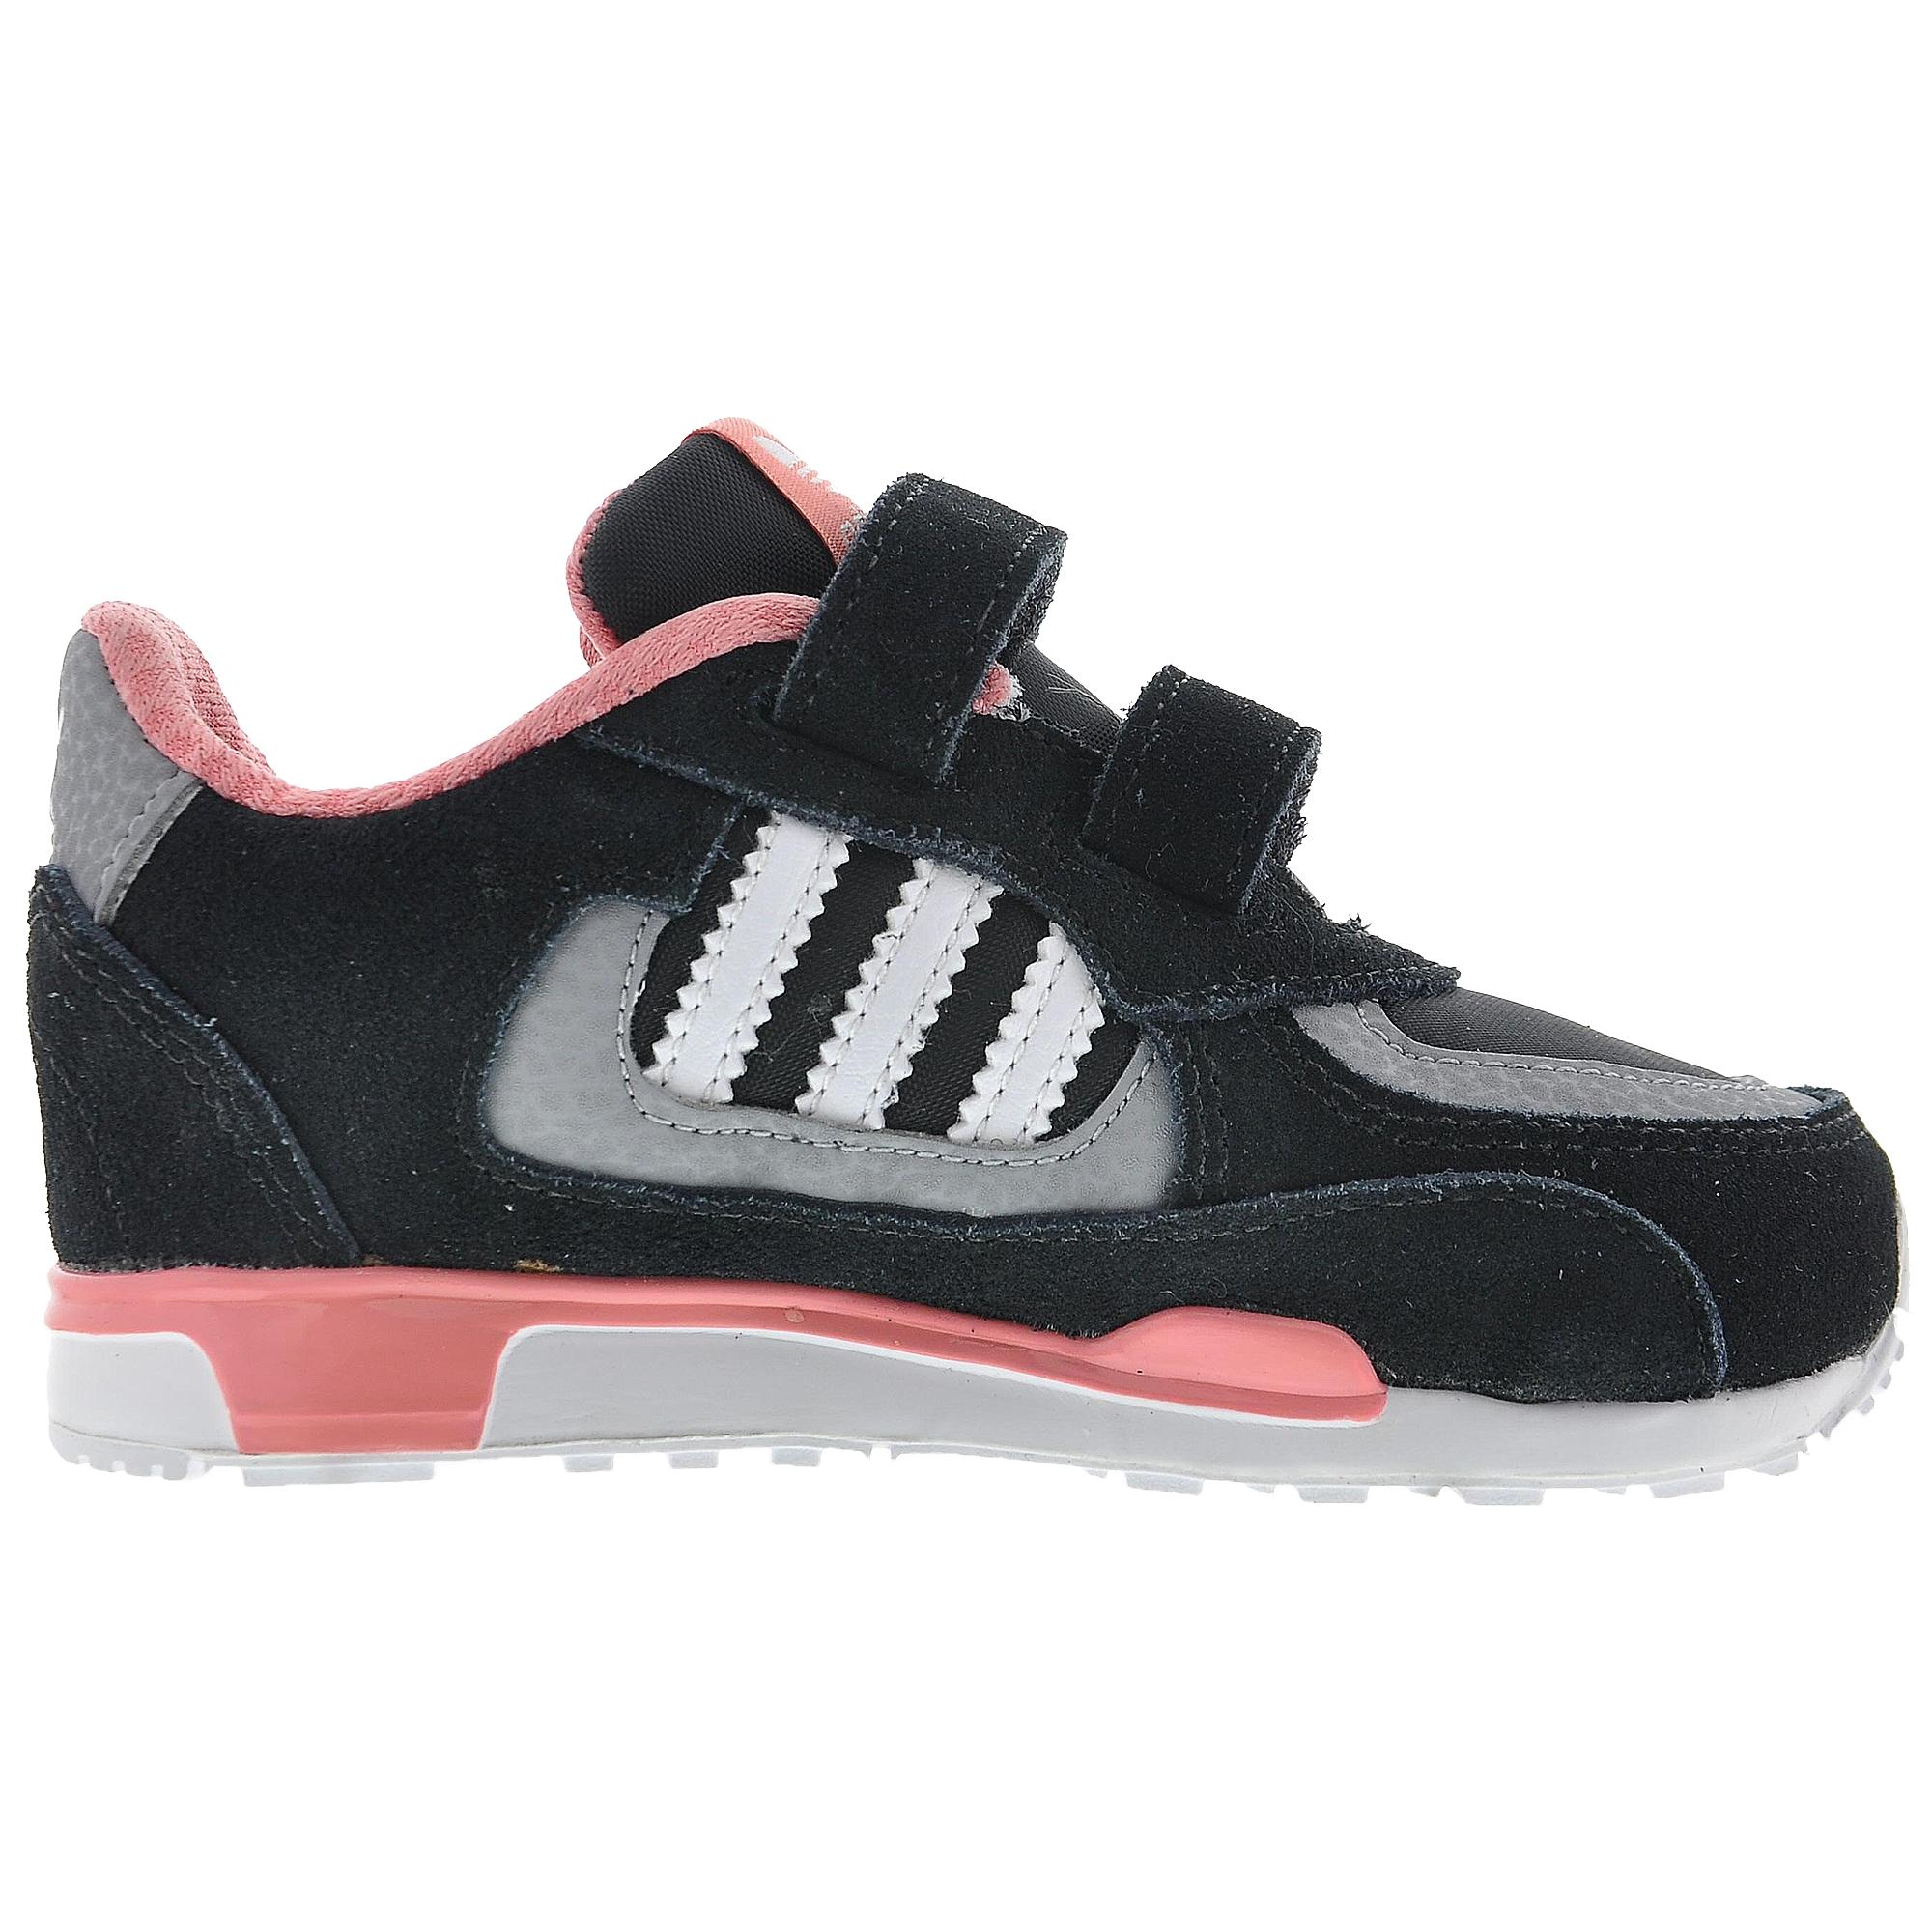 Adidas Originals ZX 8000 Boost cortos gris Weiss Flux 700 gris zapatillas